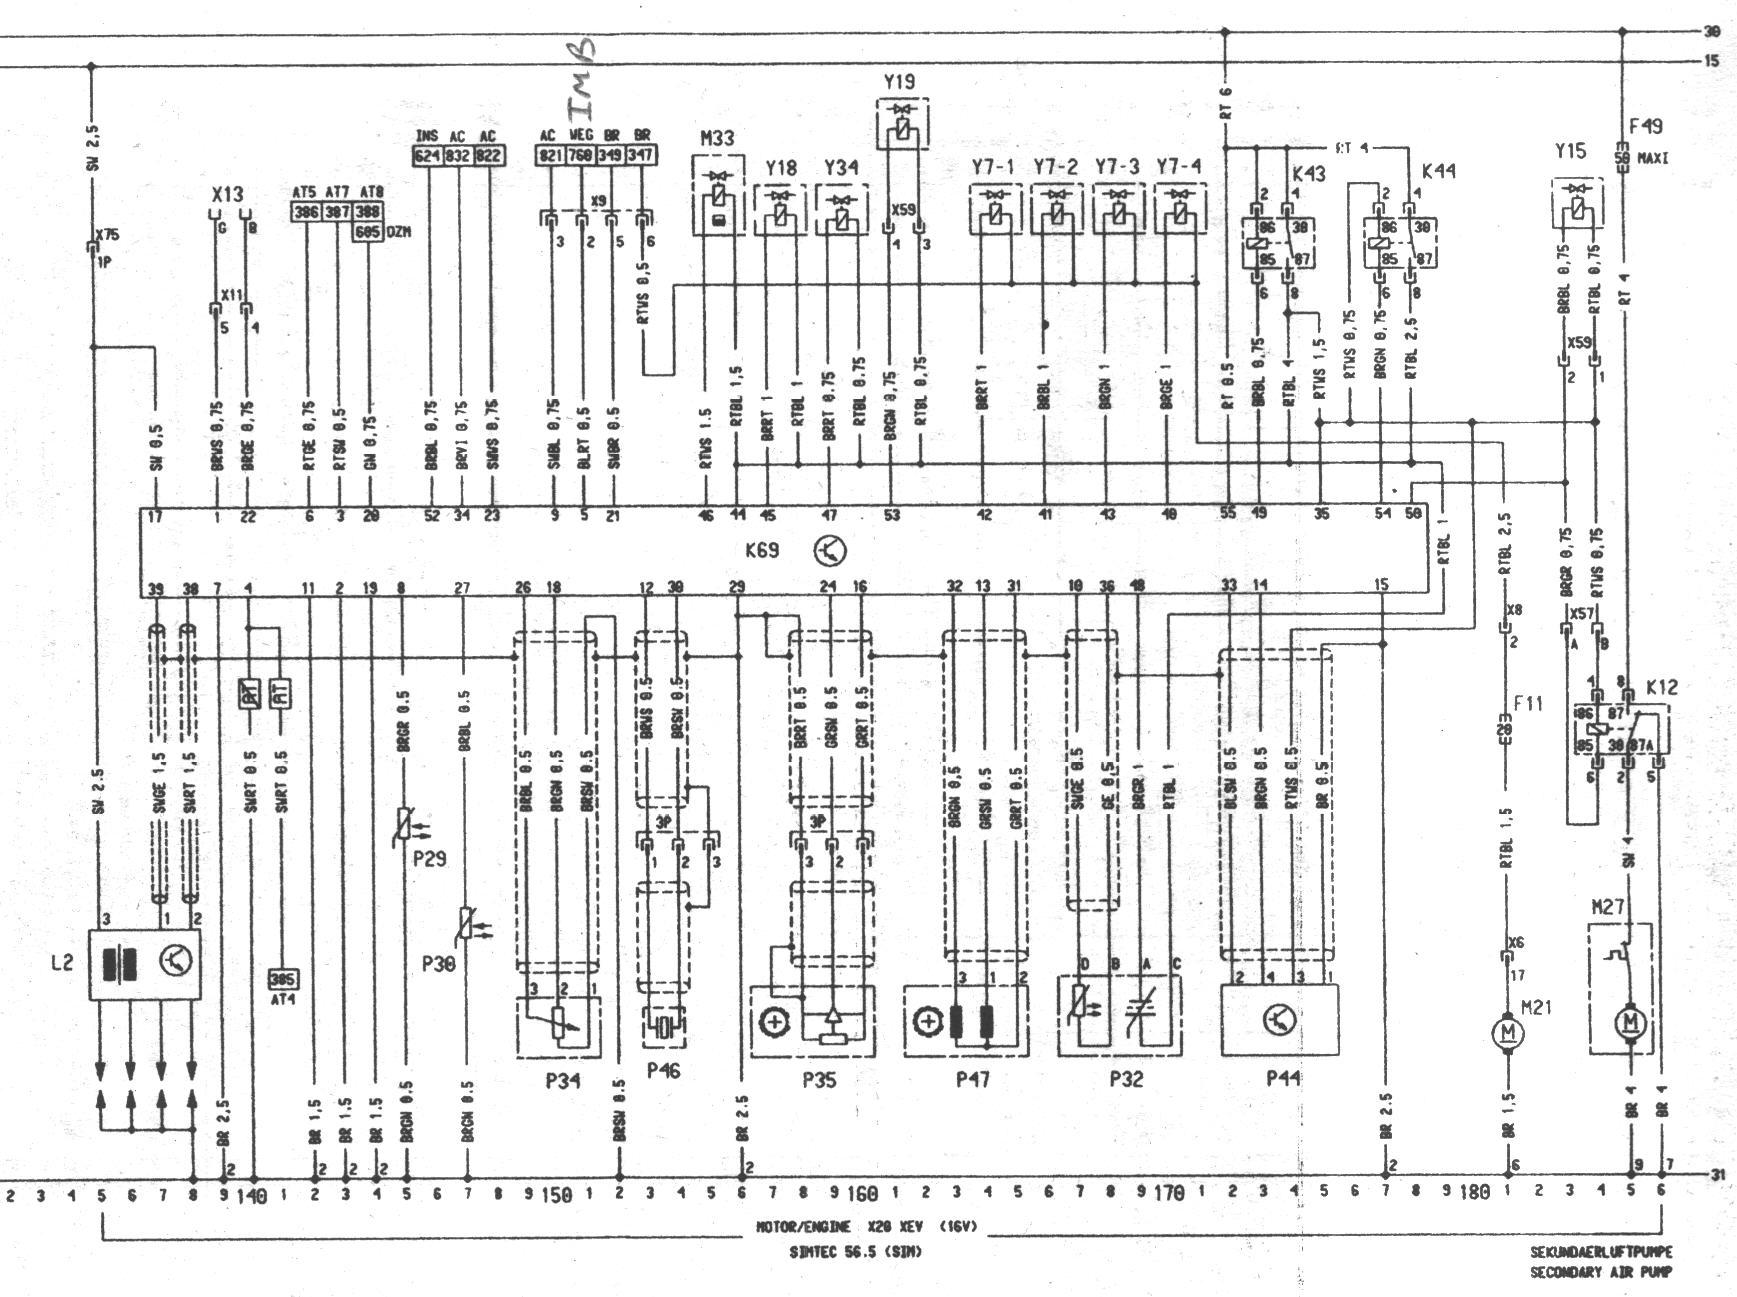 opel meriva 2004 wiring diagram sb 6143  opel omega b cruise control wiring diagram schematic wiring  opel omega b cruise control wiring